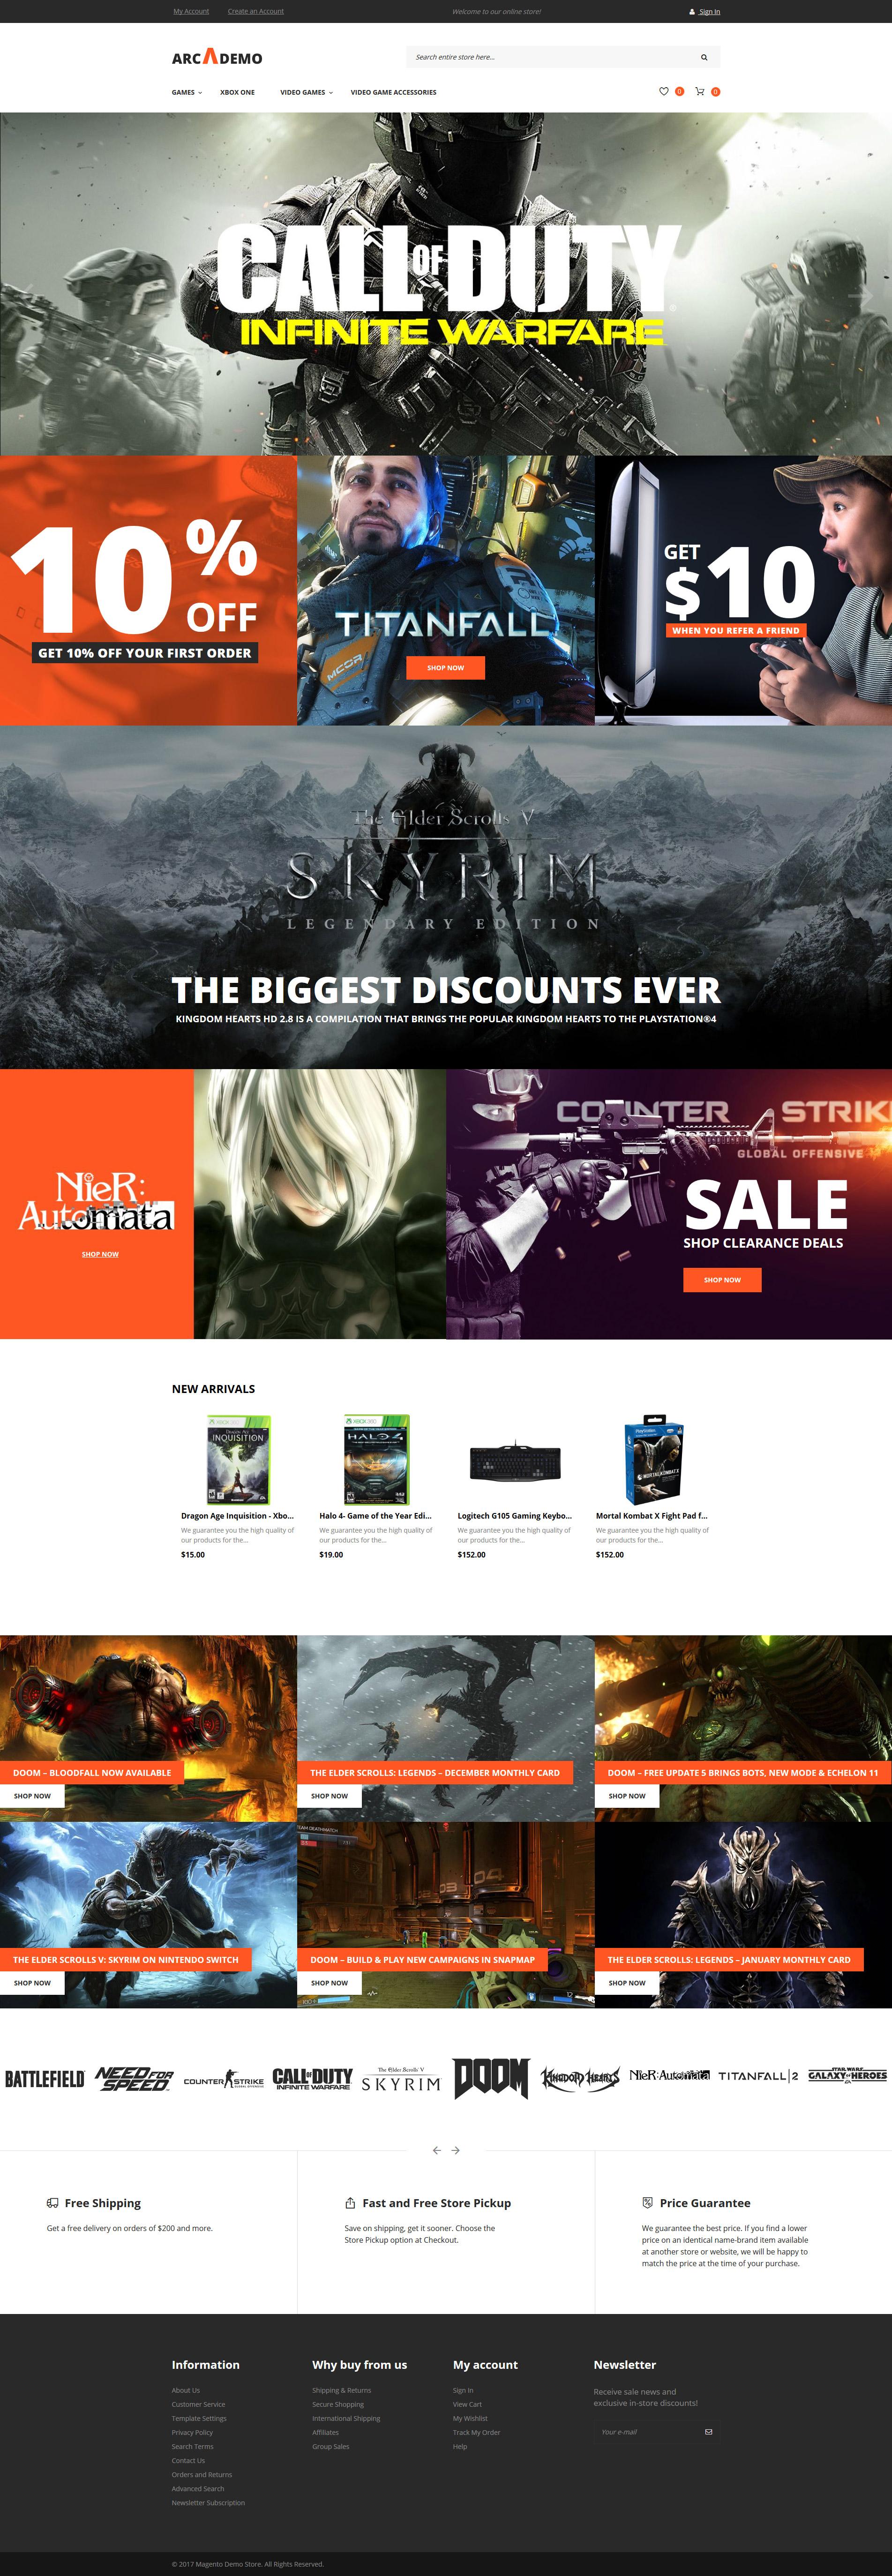 Arcademo - Video Games Shop Responsive Tema Magento №62335